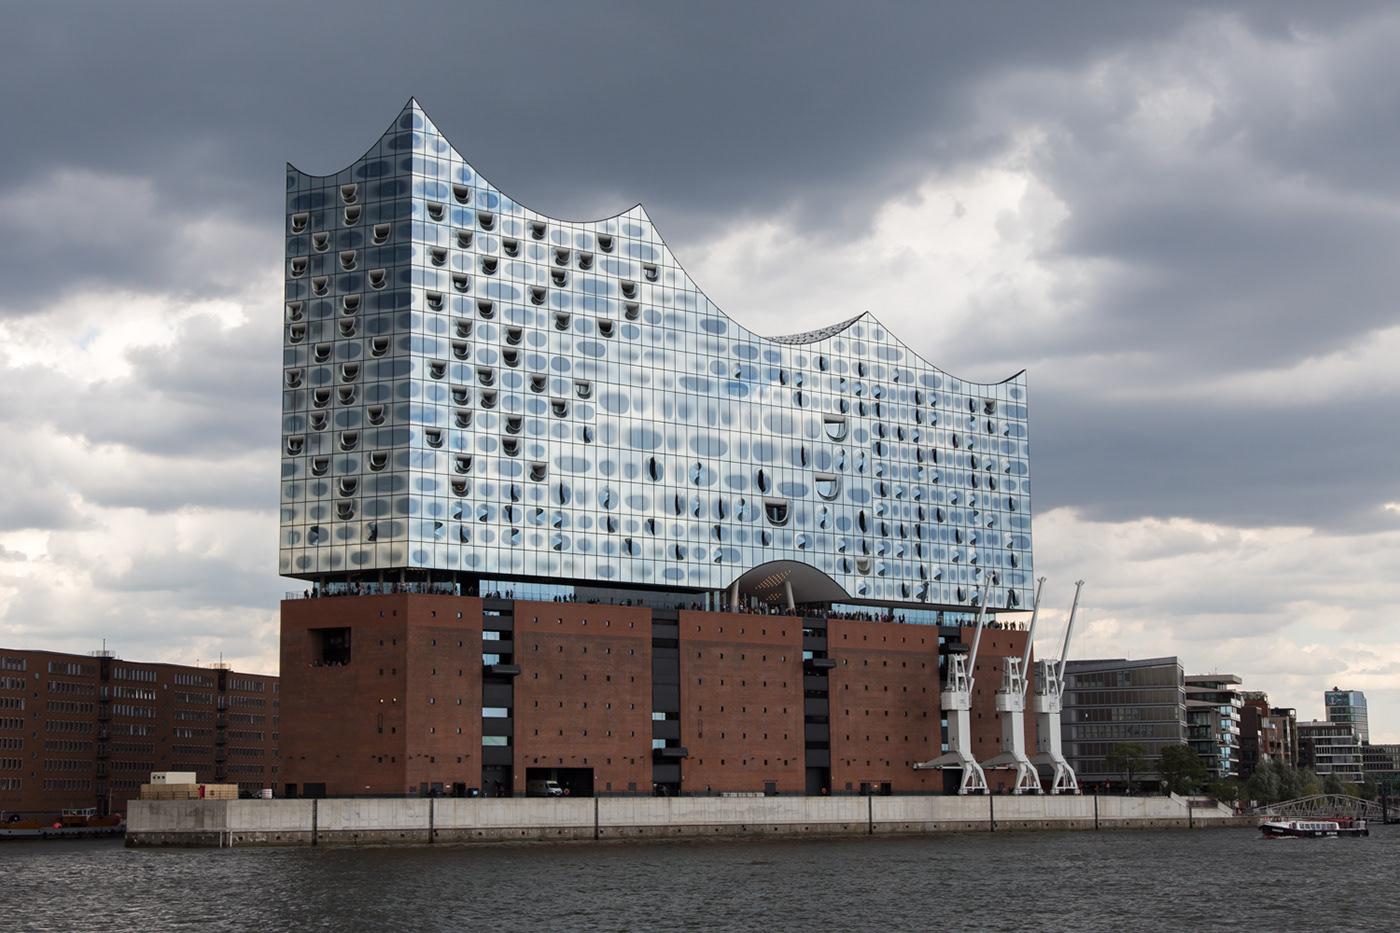 hamburg amburgo Hafencity hafen harbour boat germany elbphilharmonie